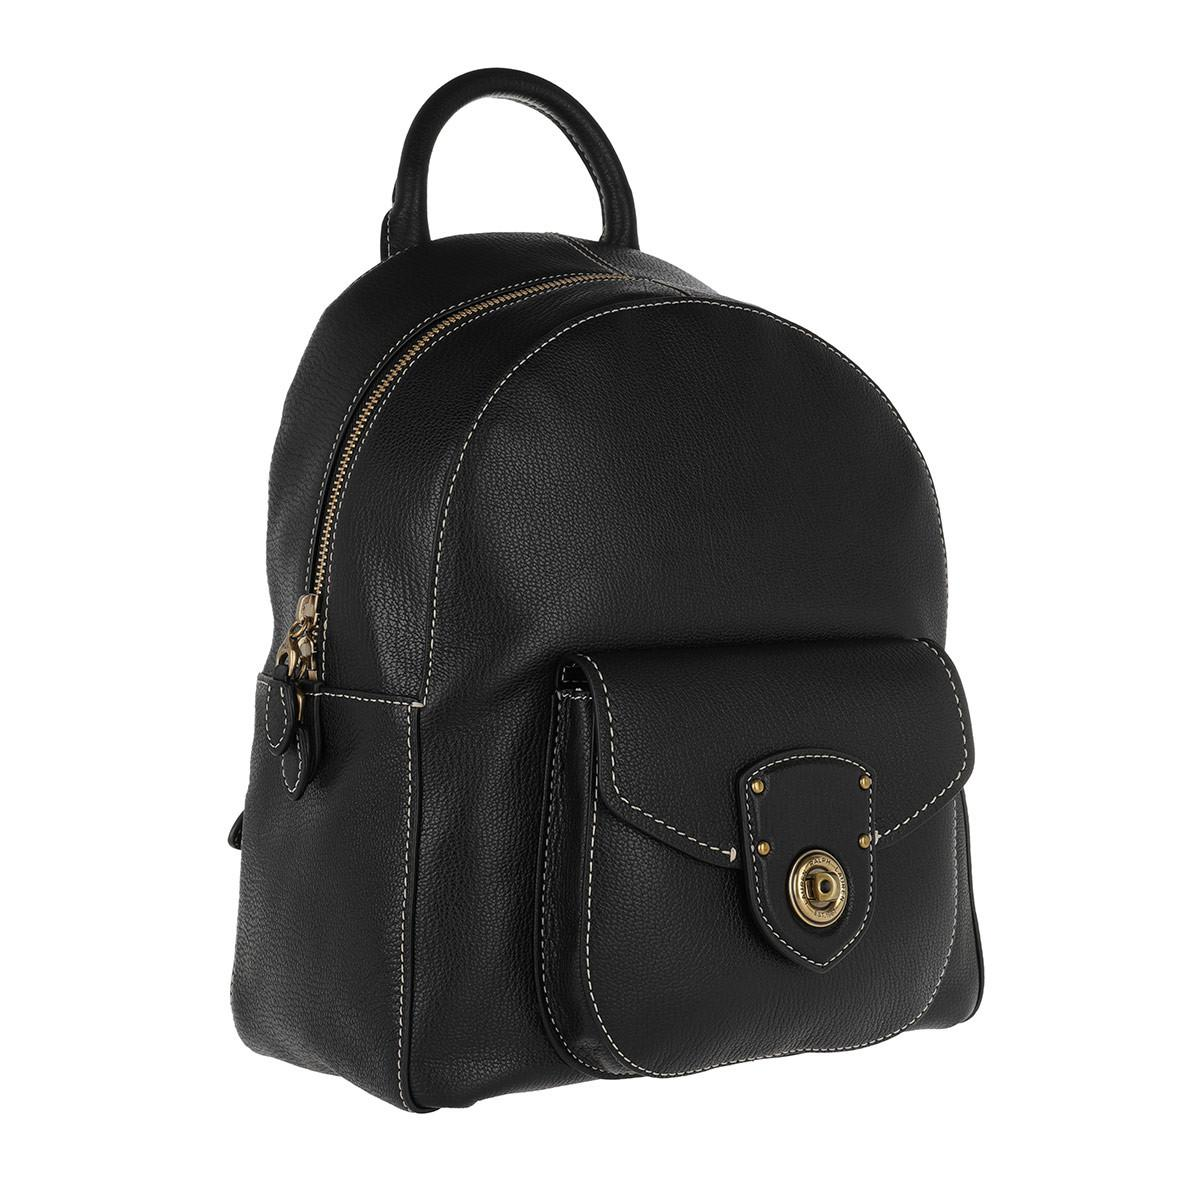 5e16f0da23 Lauren by Ralph Lauren Millbrook Backpack Medium Black in Black - Lyst